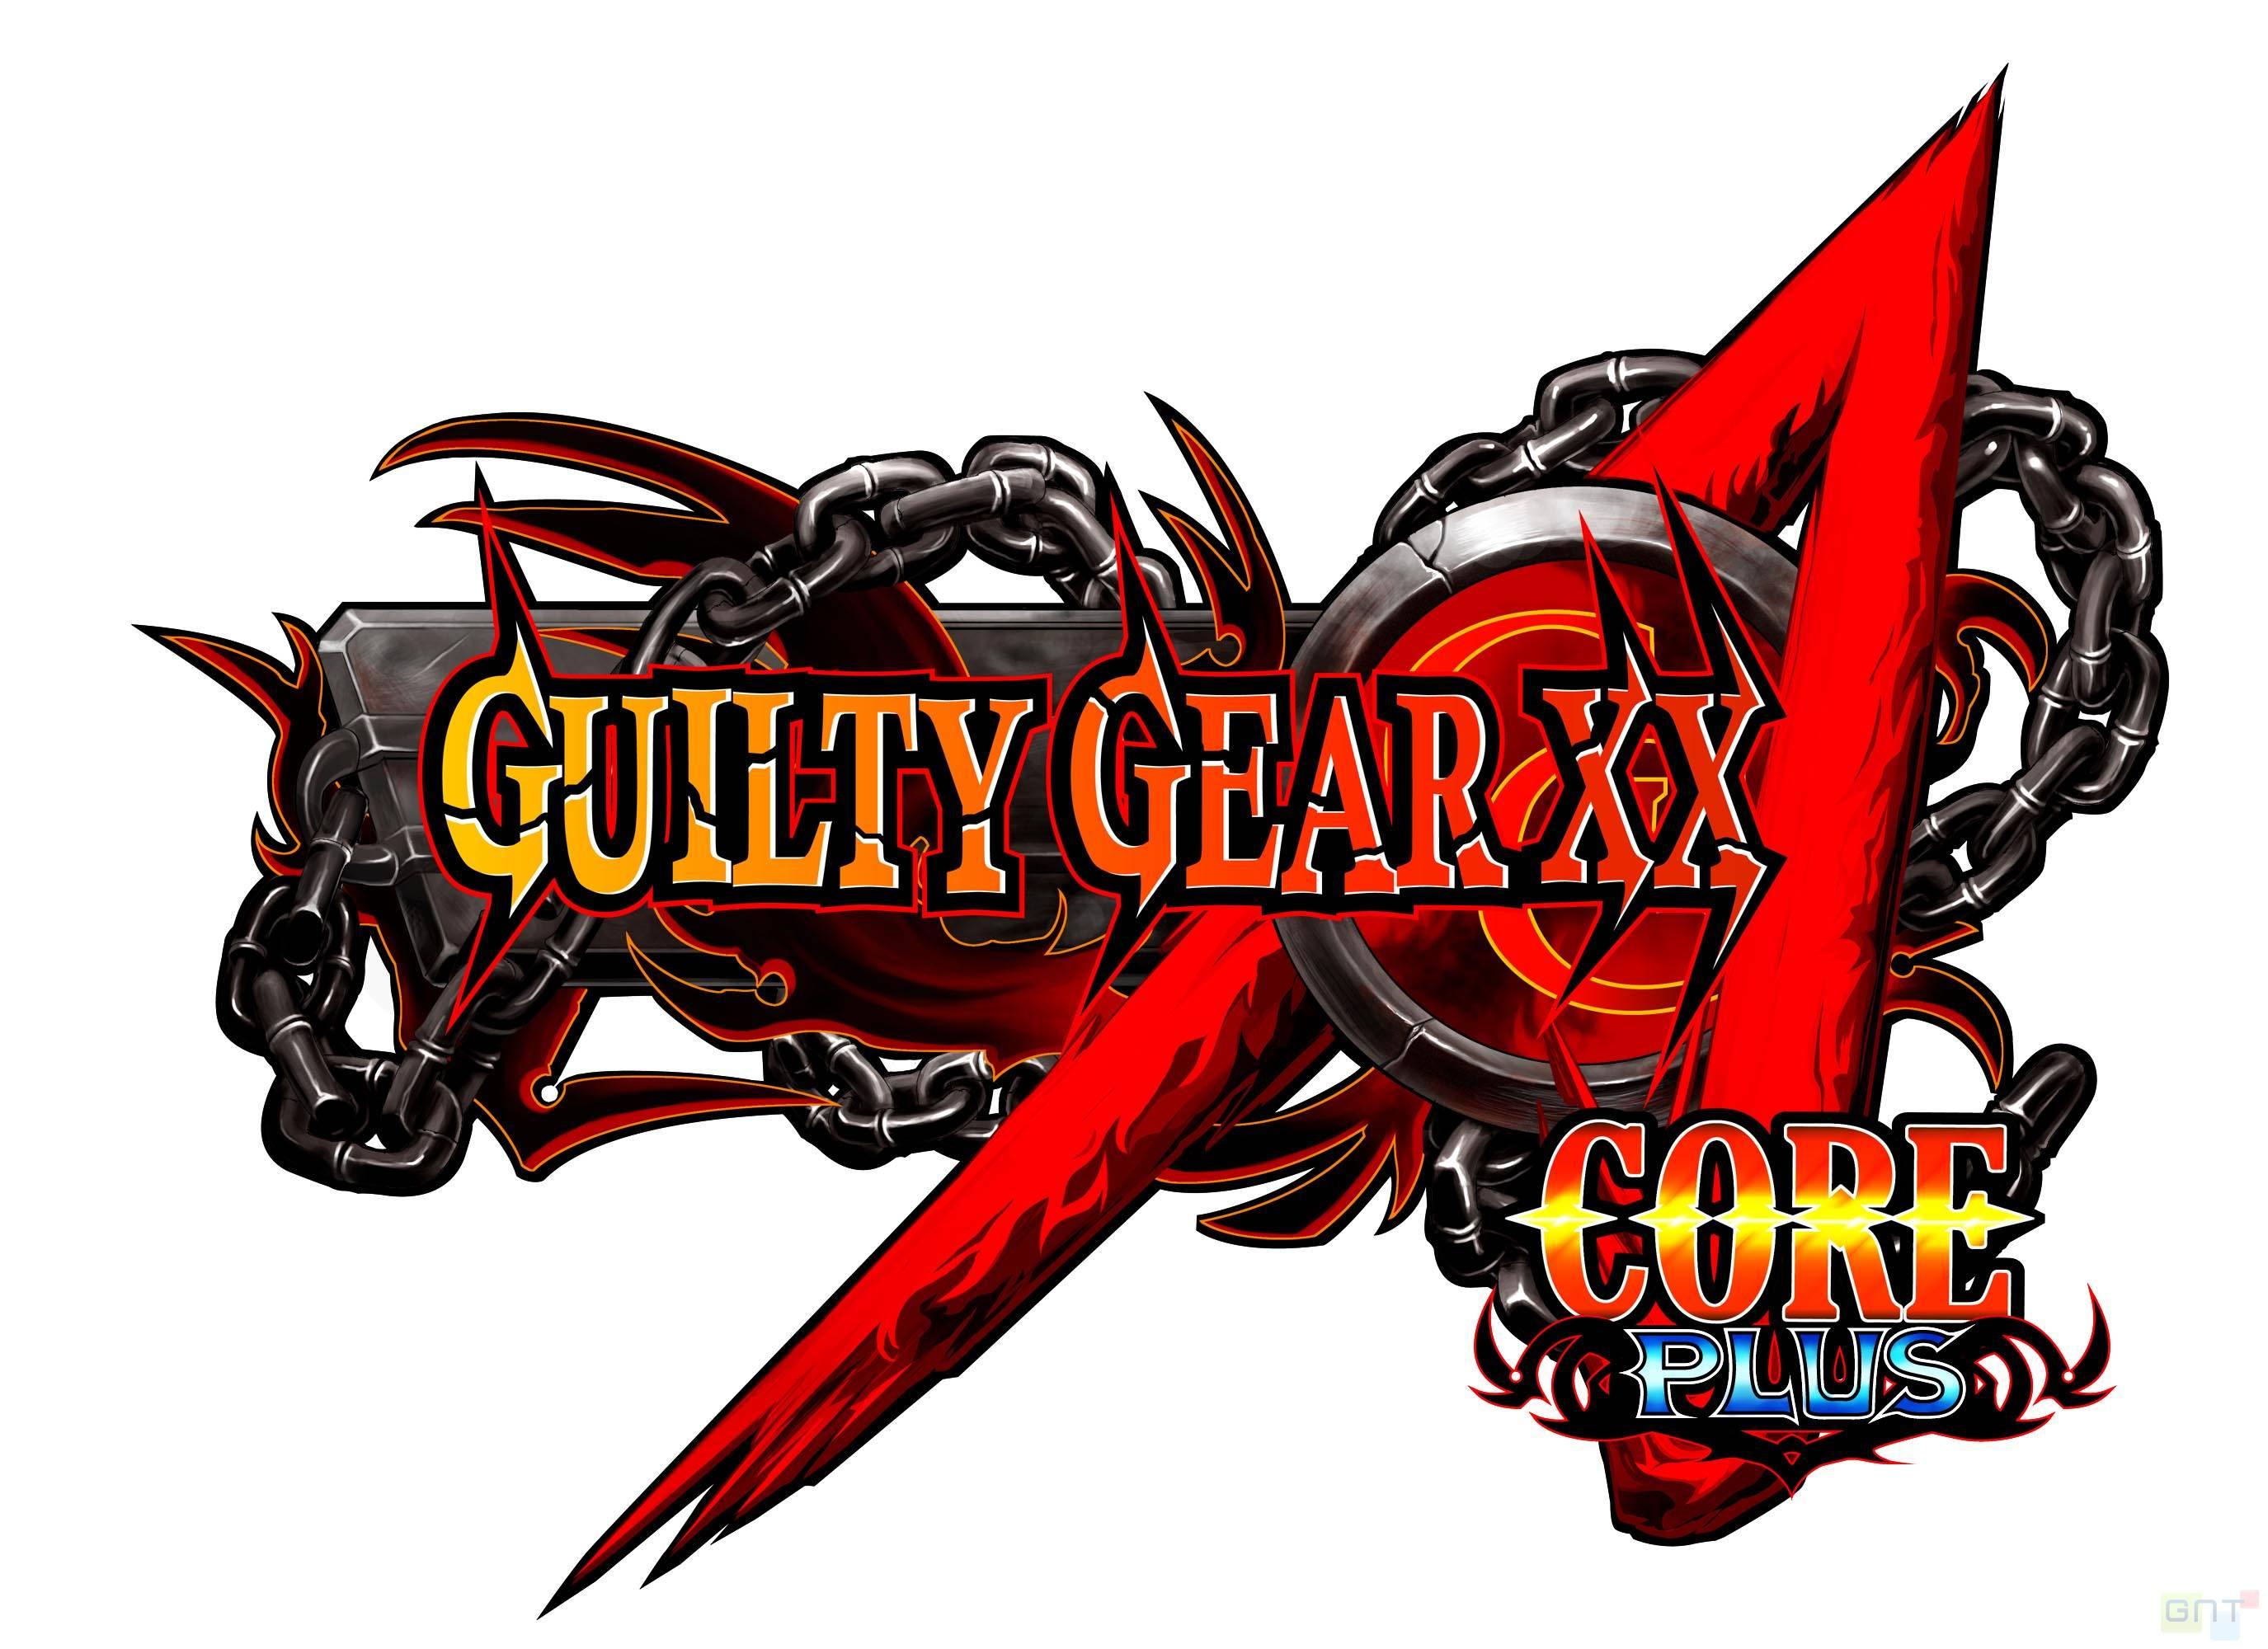 High Resolution Wallpaper | Guilty Gear XX Accent Core Plus 2750x2000 px